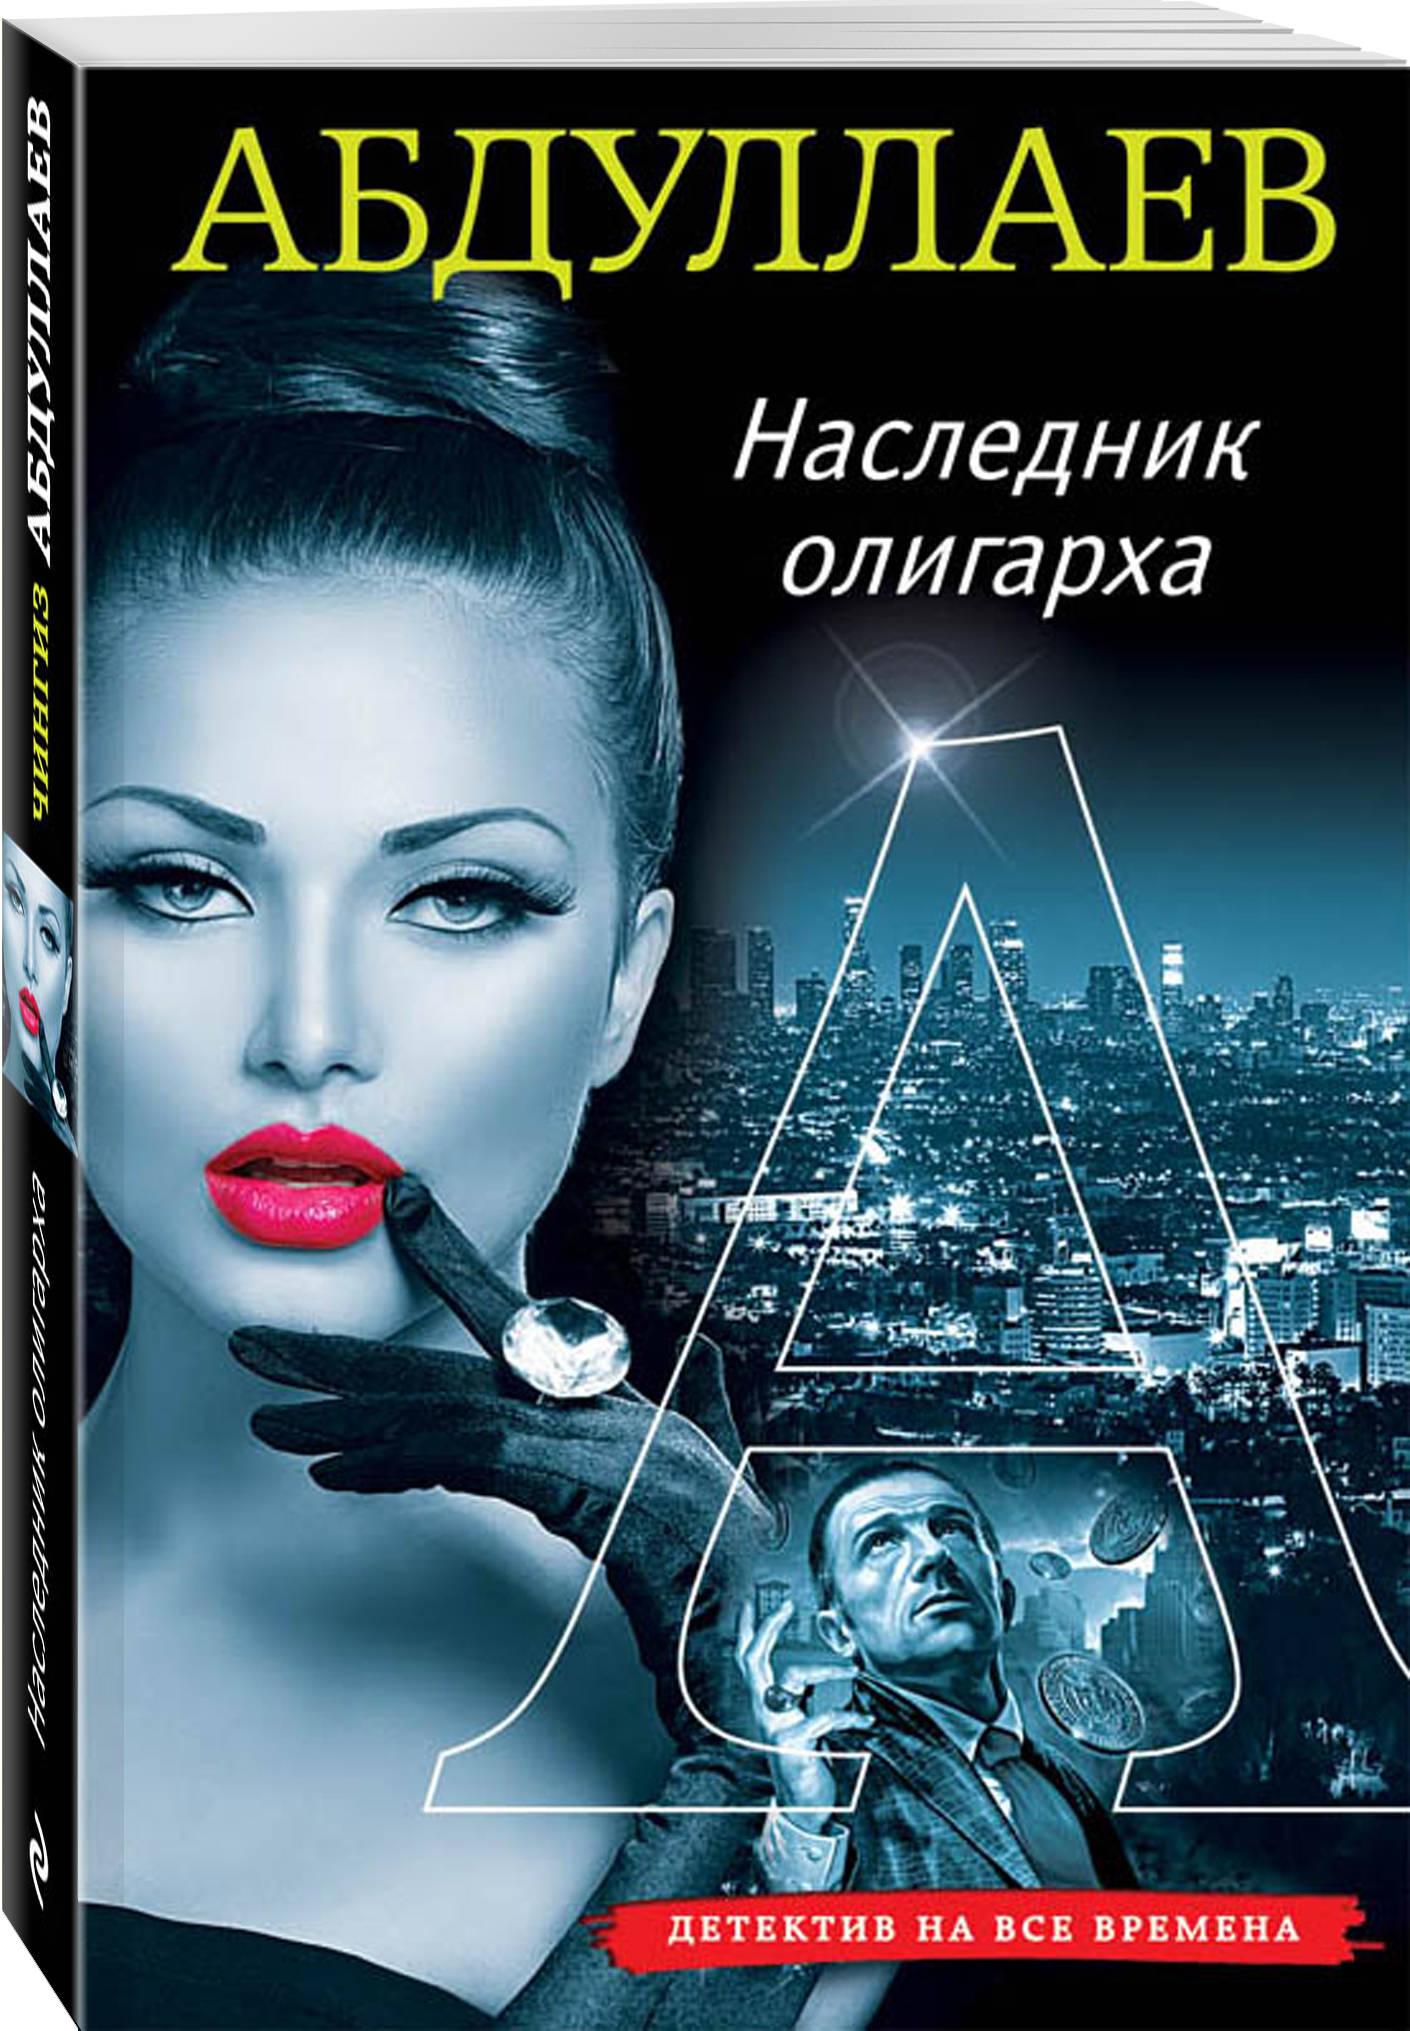 Наследник олигарха ( Абдуллаев Ч.А.  )